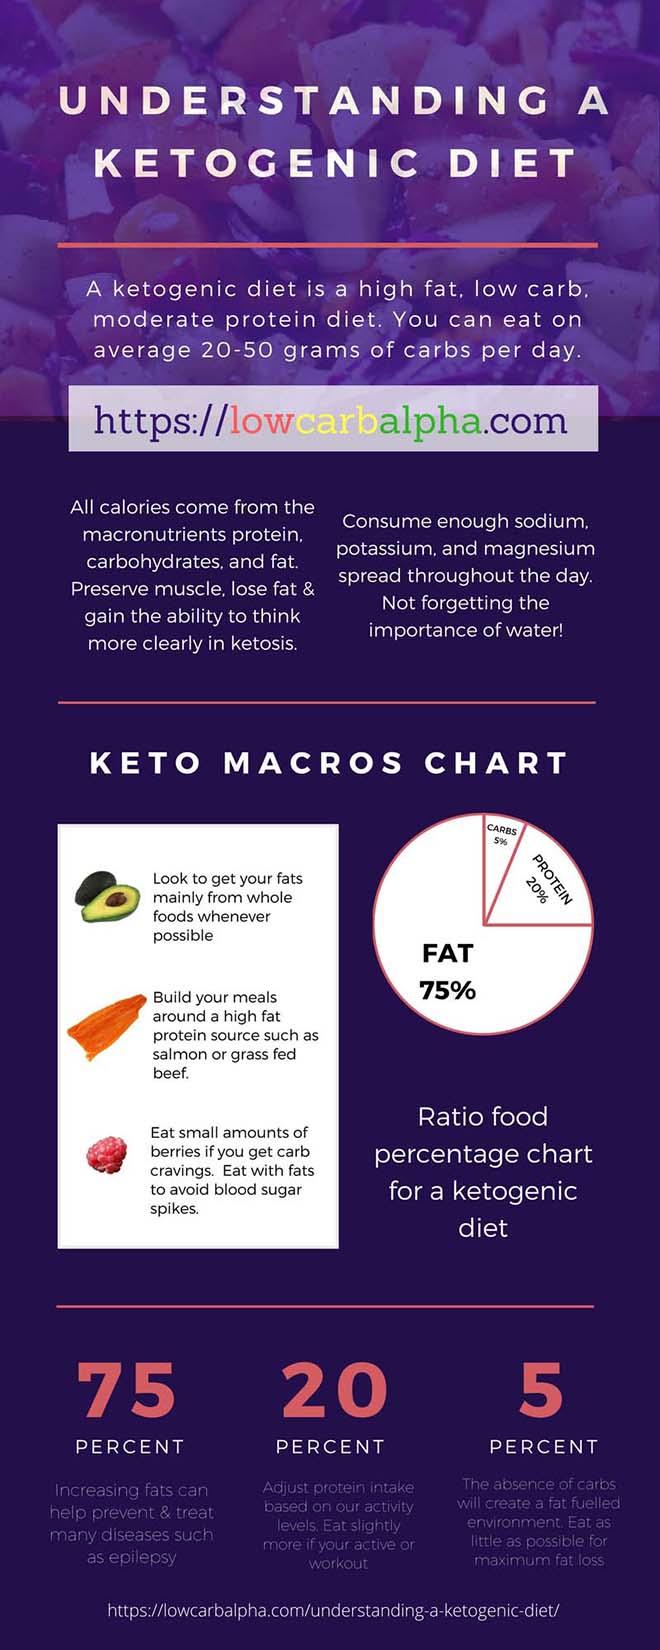 Understanding a Ketogenic Diet